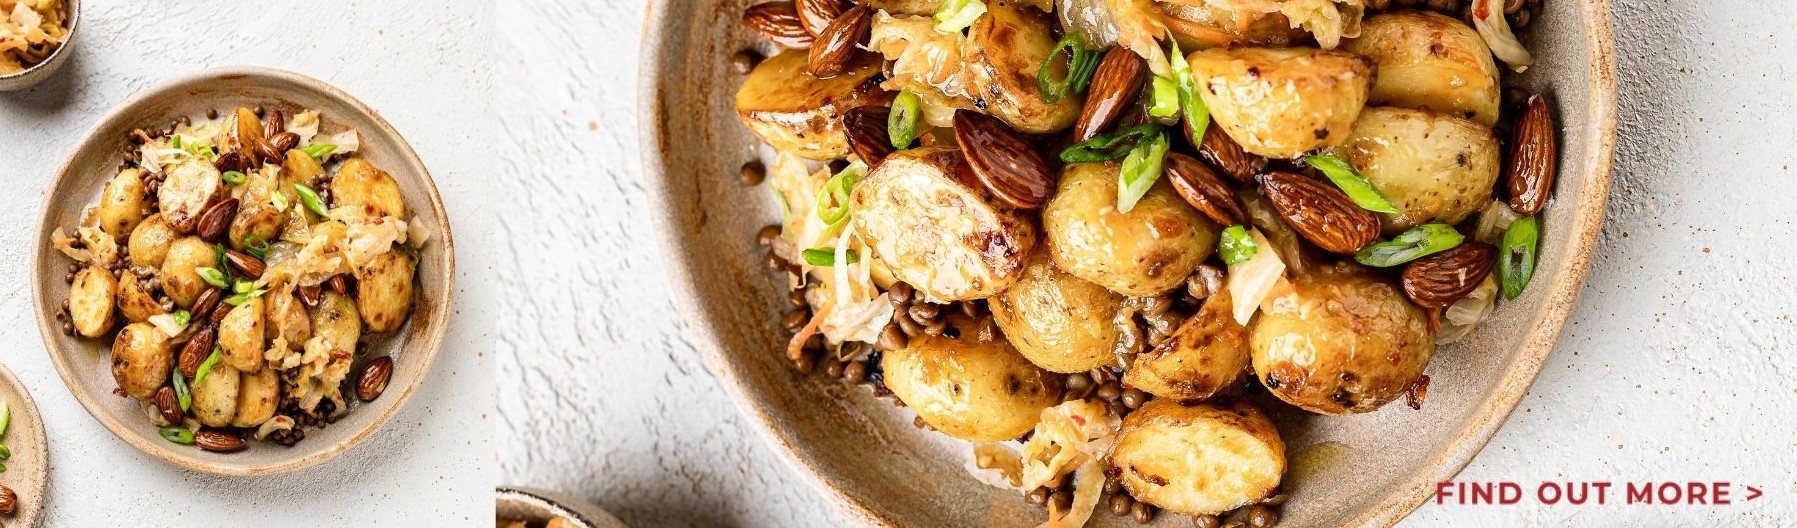 Roast Miso Potato, Kimchi and Lentil Salad at Nourish